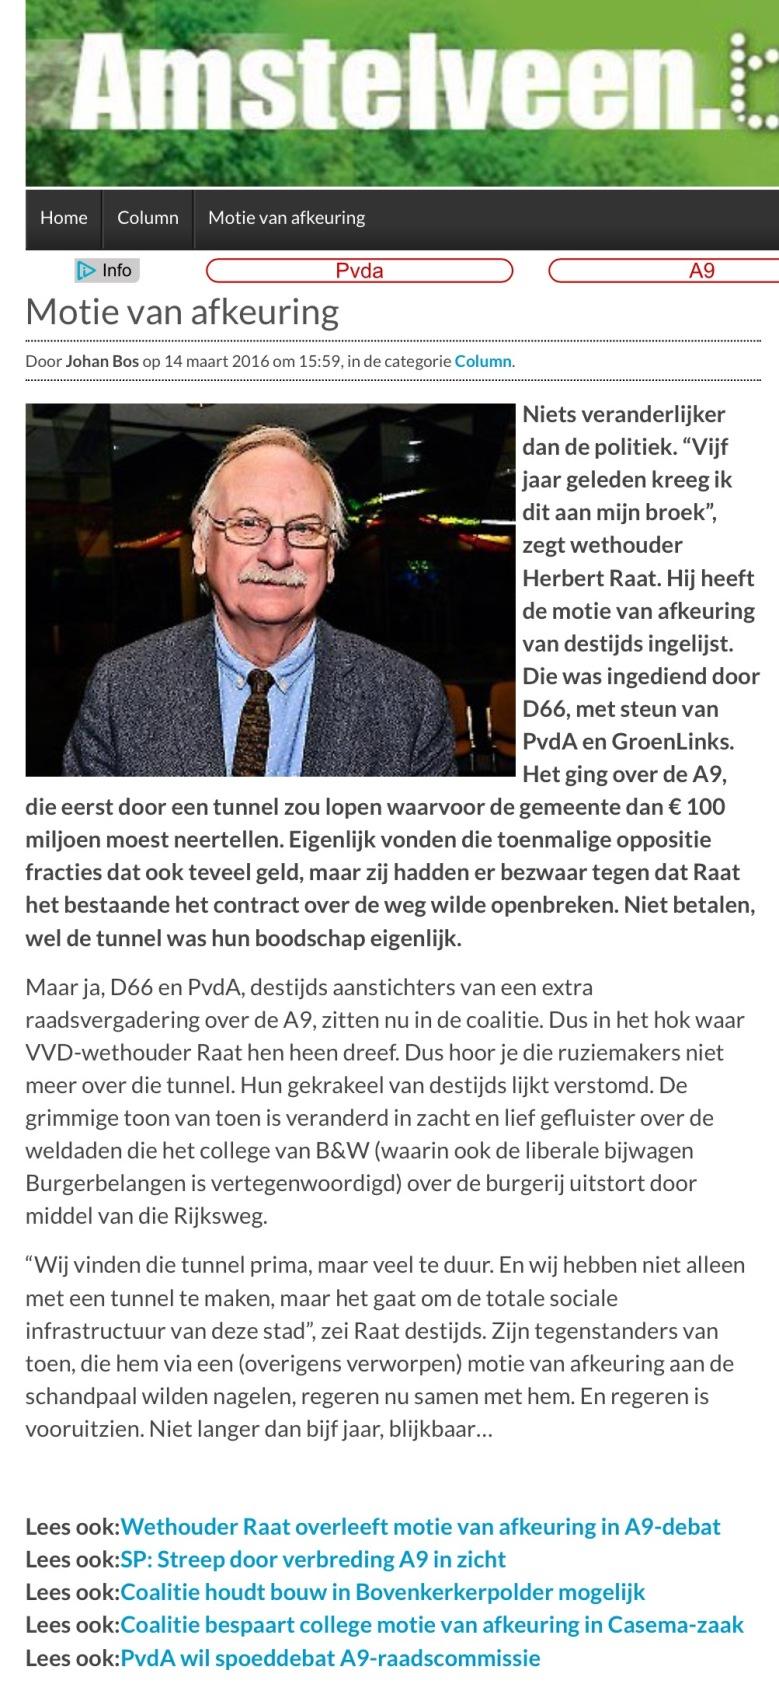 2016-14-3 Column Johan Bos over A9 Amstelveen op AmstelveenBlog.nl